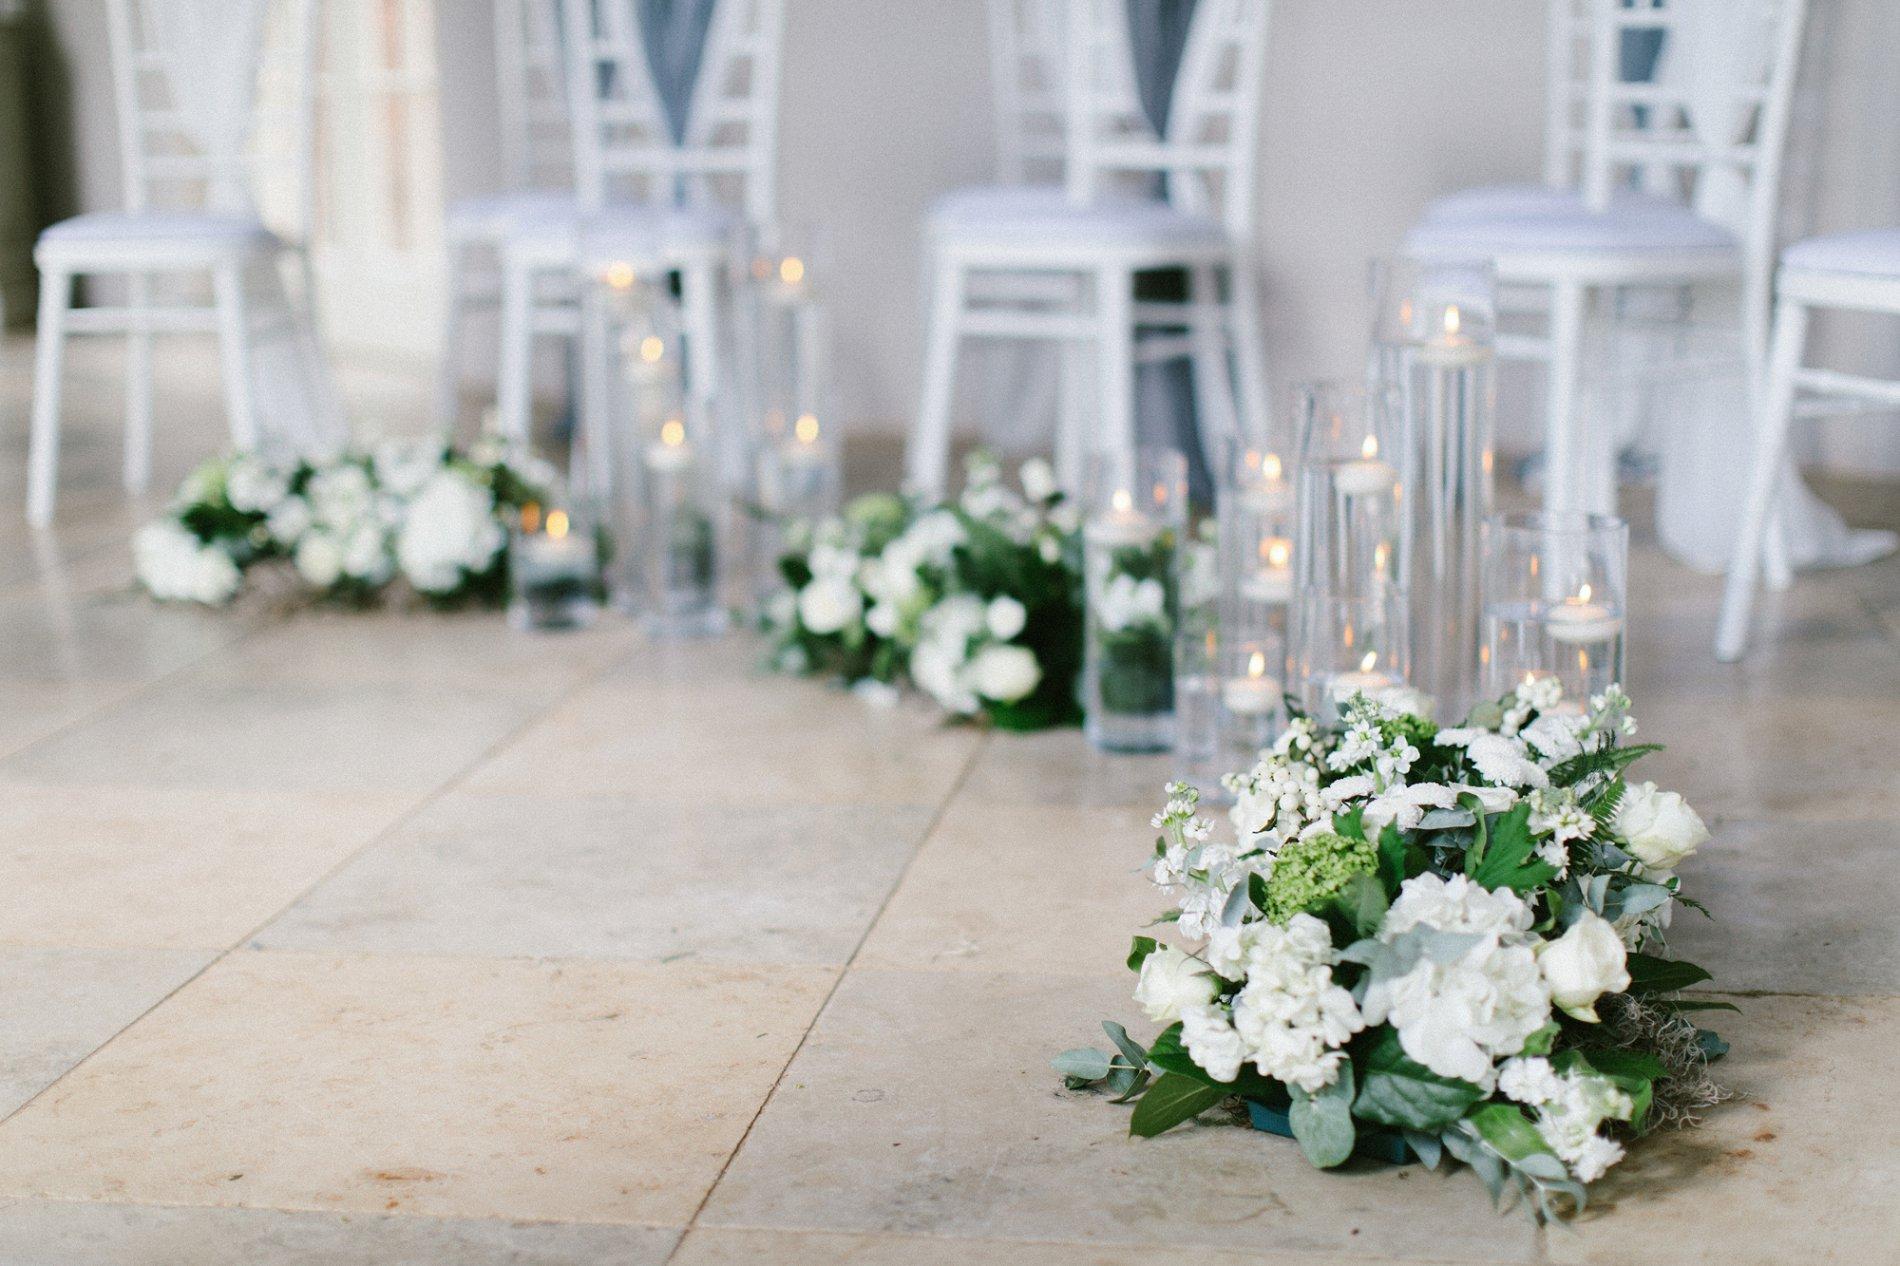 An Intimate Fine Art Wedding Shoot at Newby Hall (c) Melissa Beattie Photography (12)